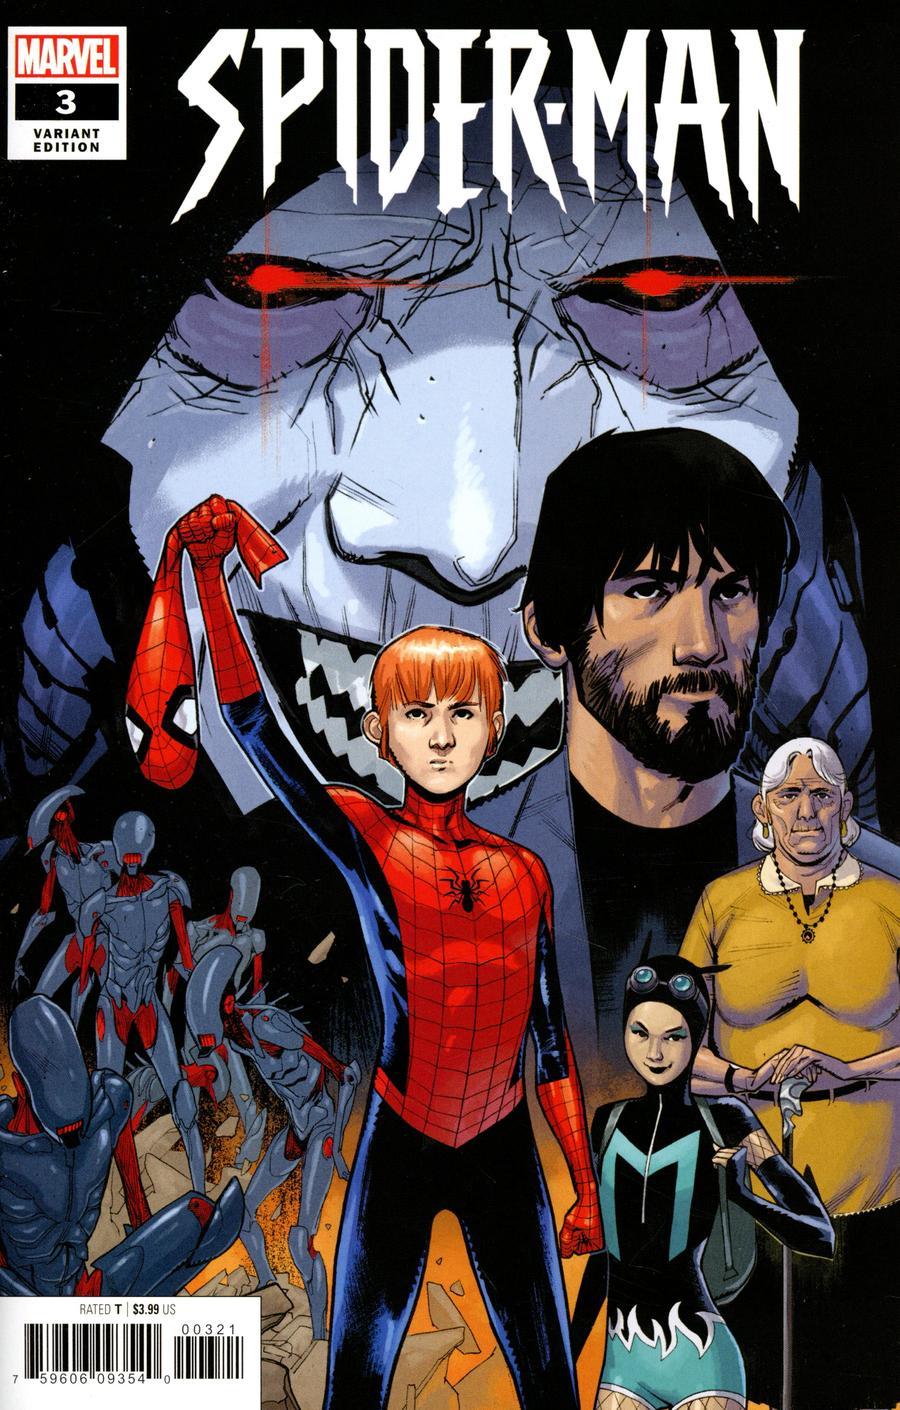 Spider-Man Vol 3 #3 Cover C Incentive Sara Pichelli Variant Cover